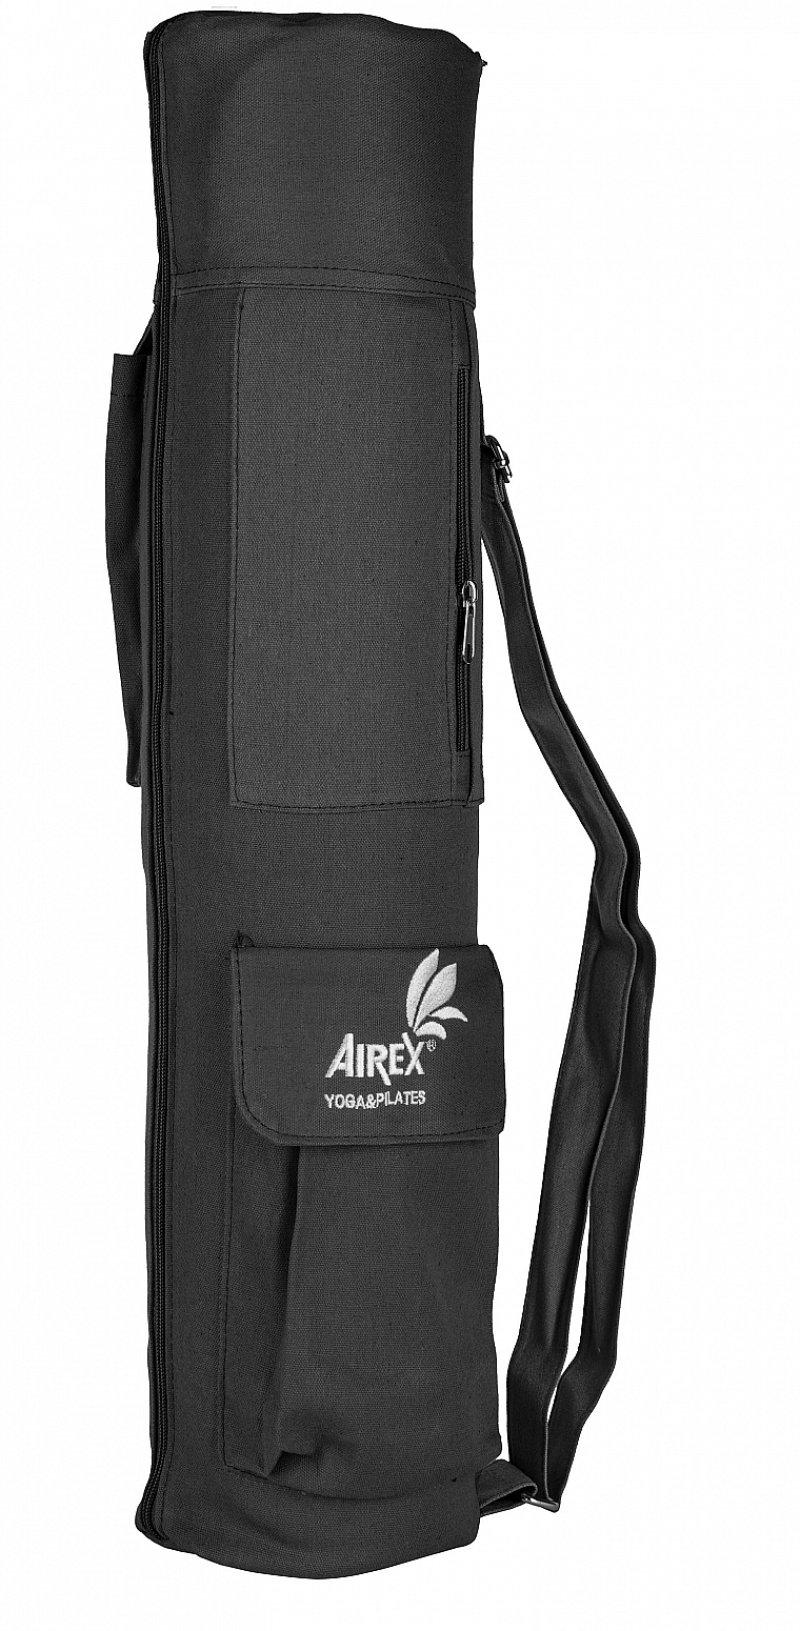 AIREX Yoga Carry Bag, Black, 100% Canvas